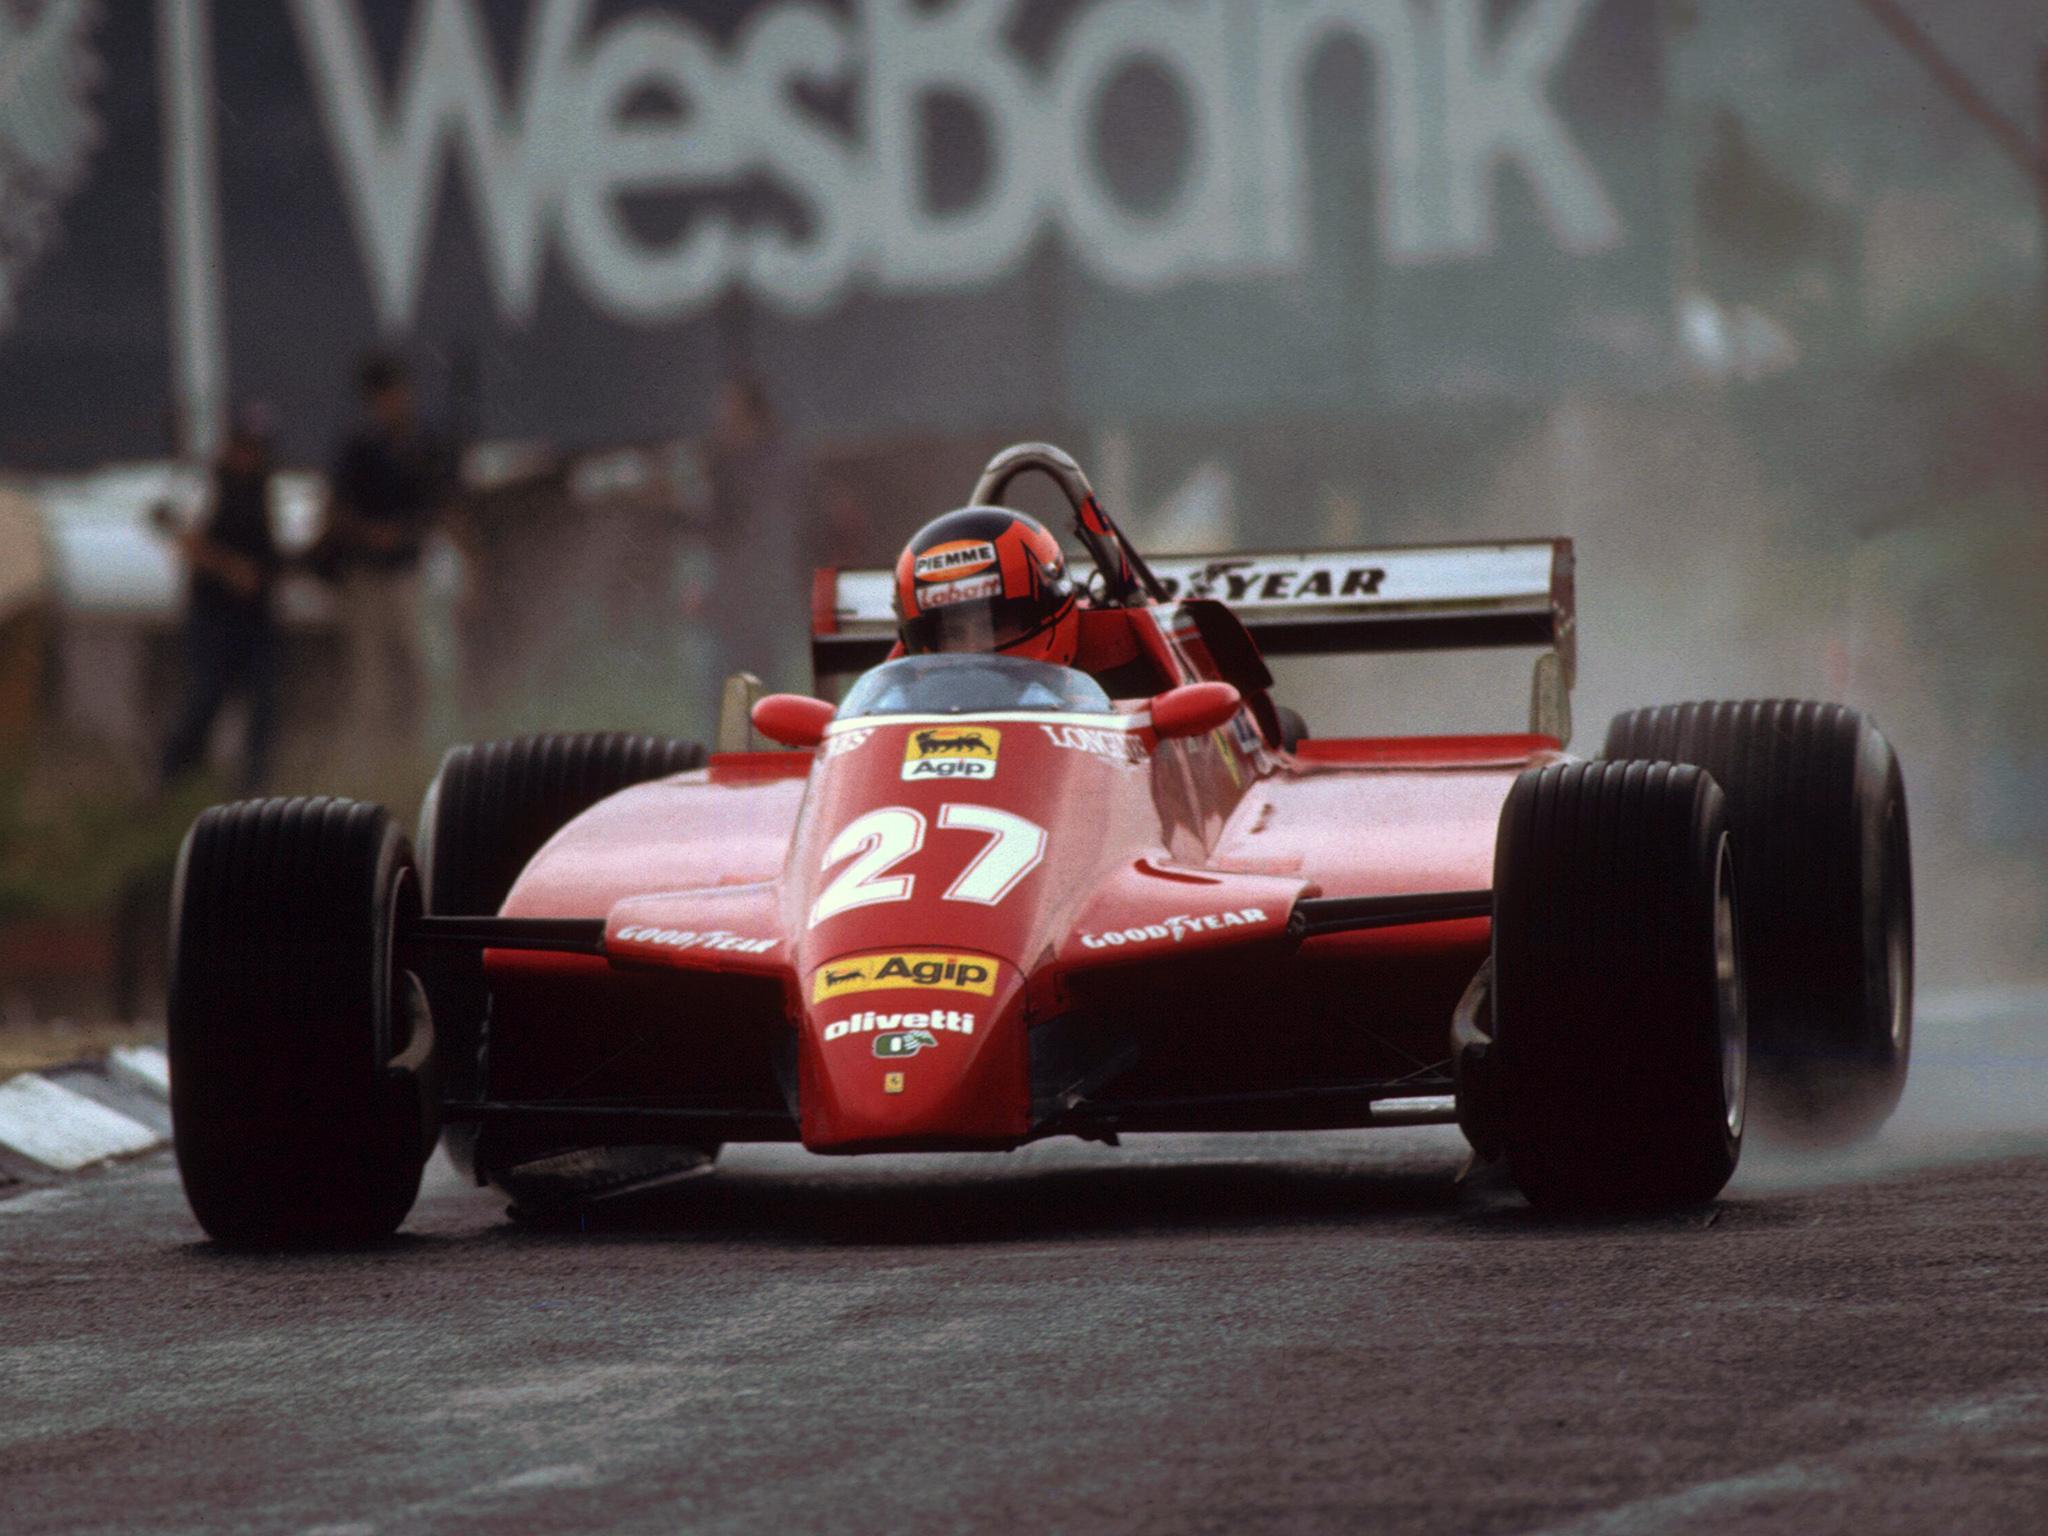 1982 ferrari 126c2 formula one f 1 race racing j wallpaper 2048x1536 143768 wallpaperup. Black Bedroom Furniture Sets. Home Design Ideas